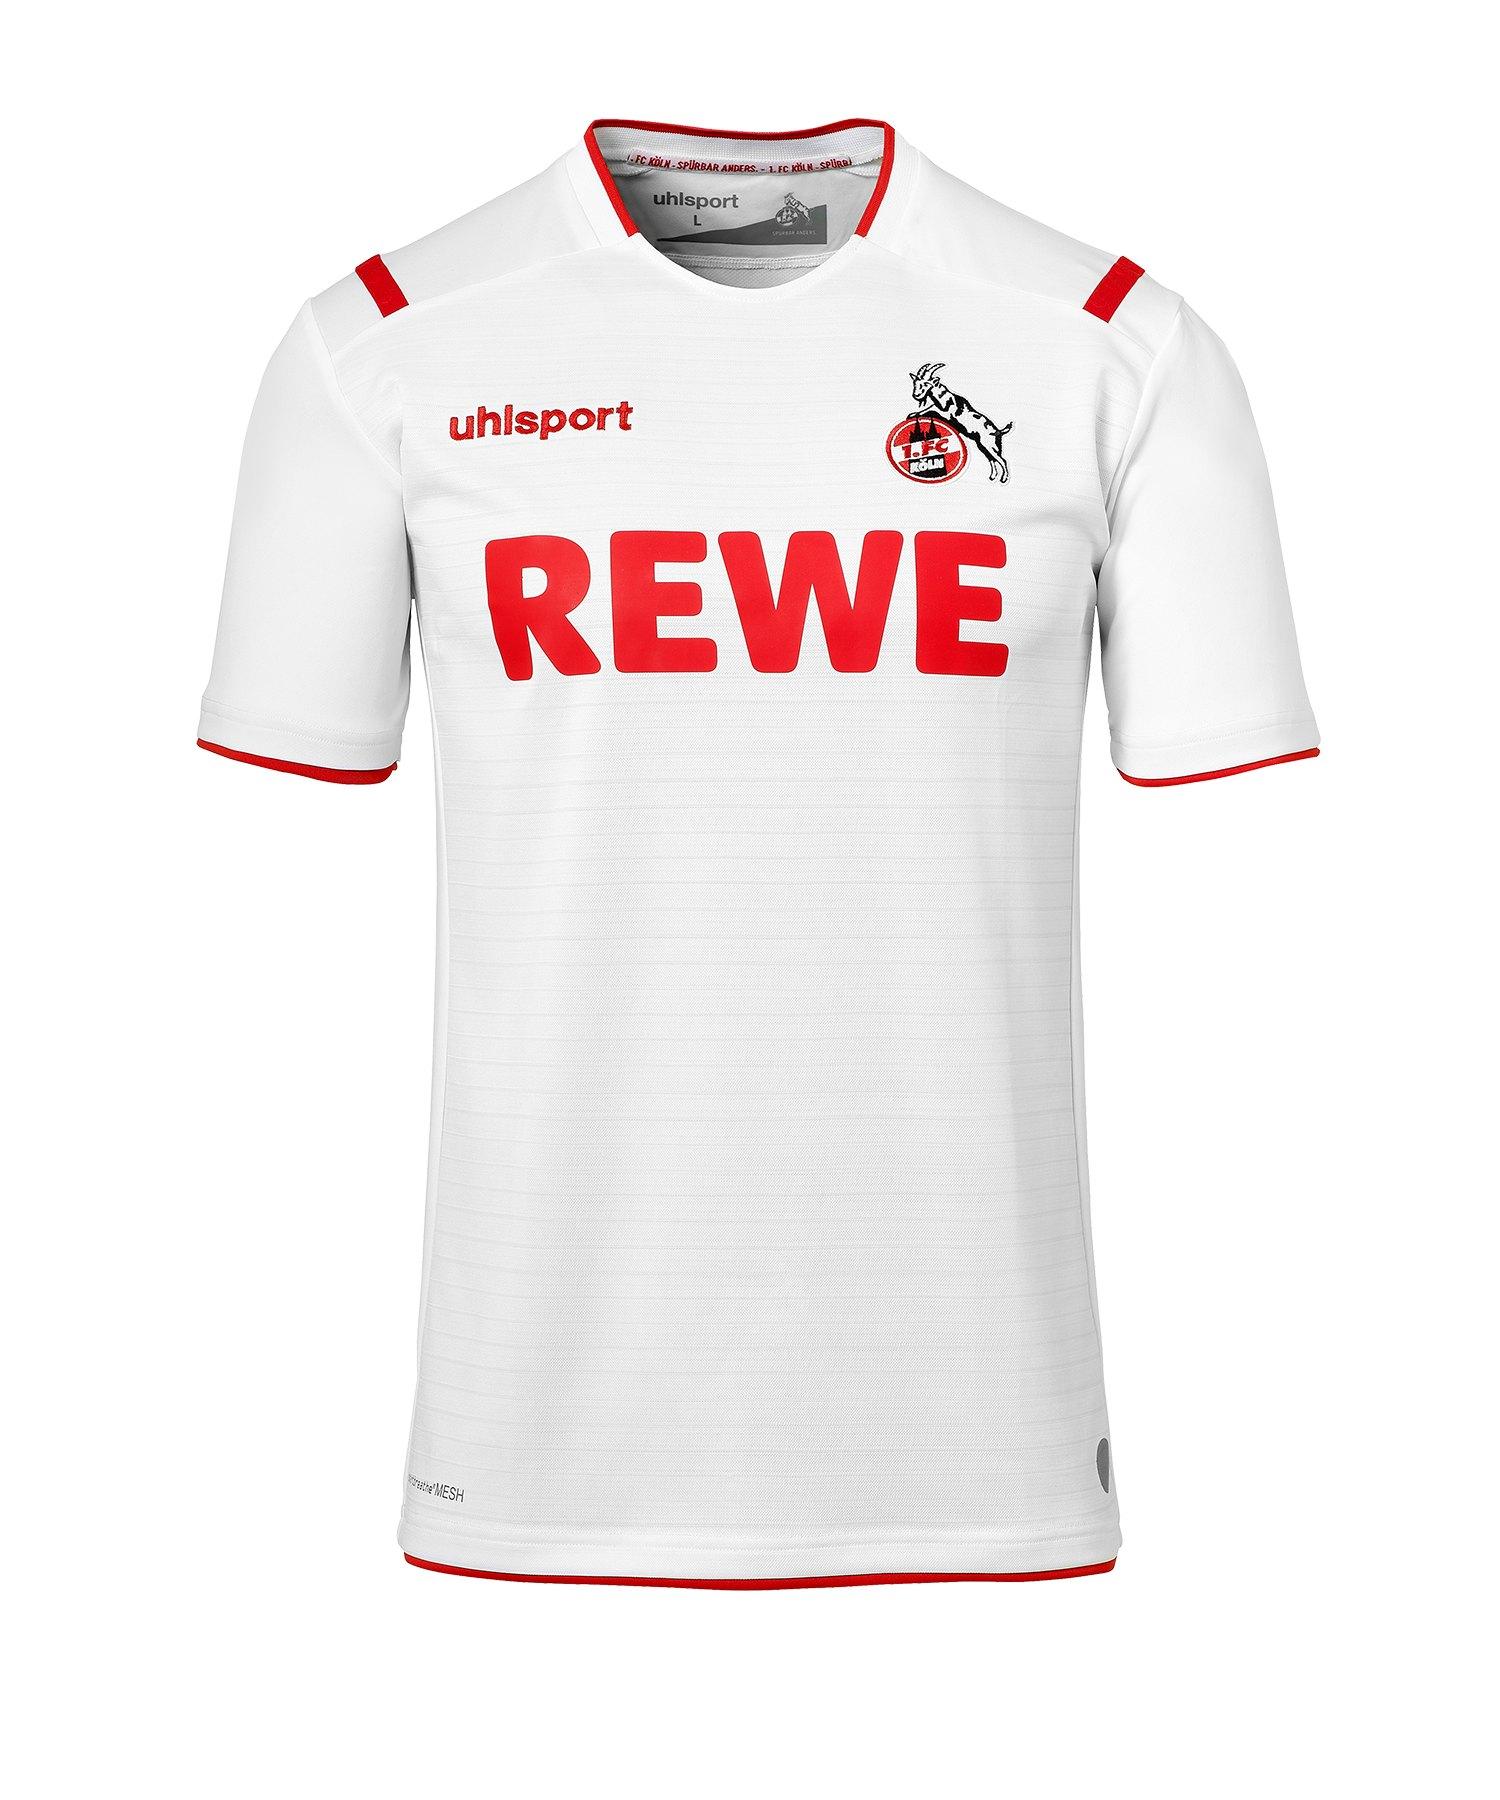 Uhlsport 1. FC Köln Trikot 3rd 2019/2020 Blau - blau